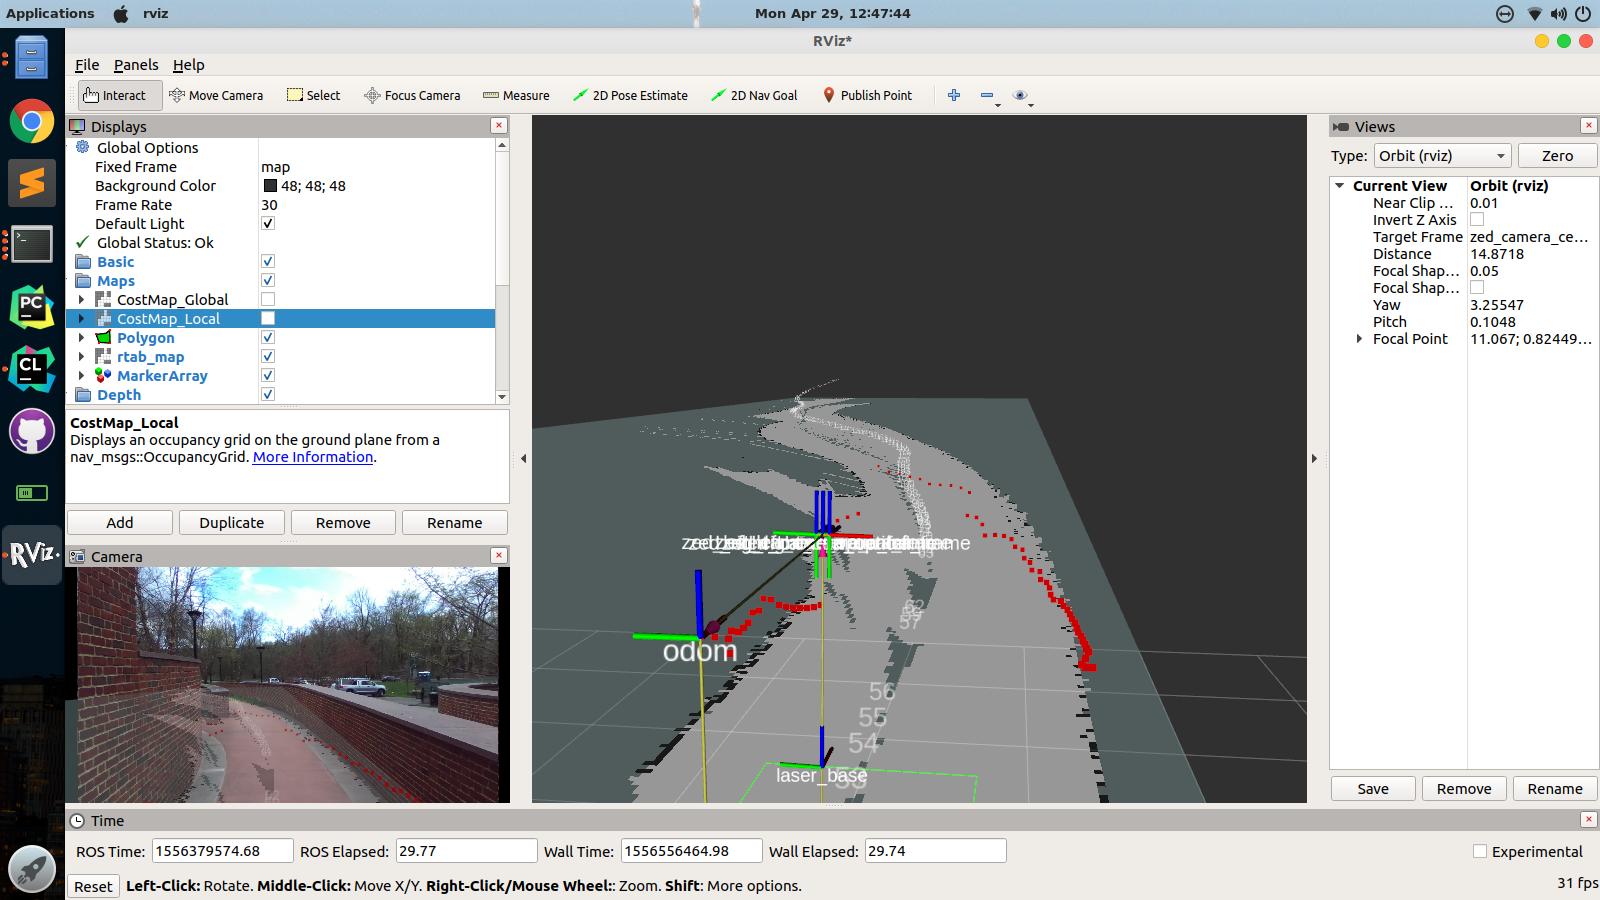 Self-Driving Golf Cart: Autonomous Navigation with the ROS